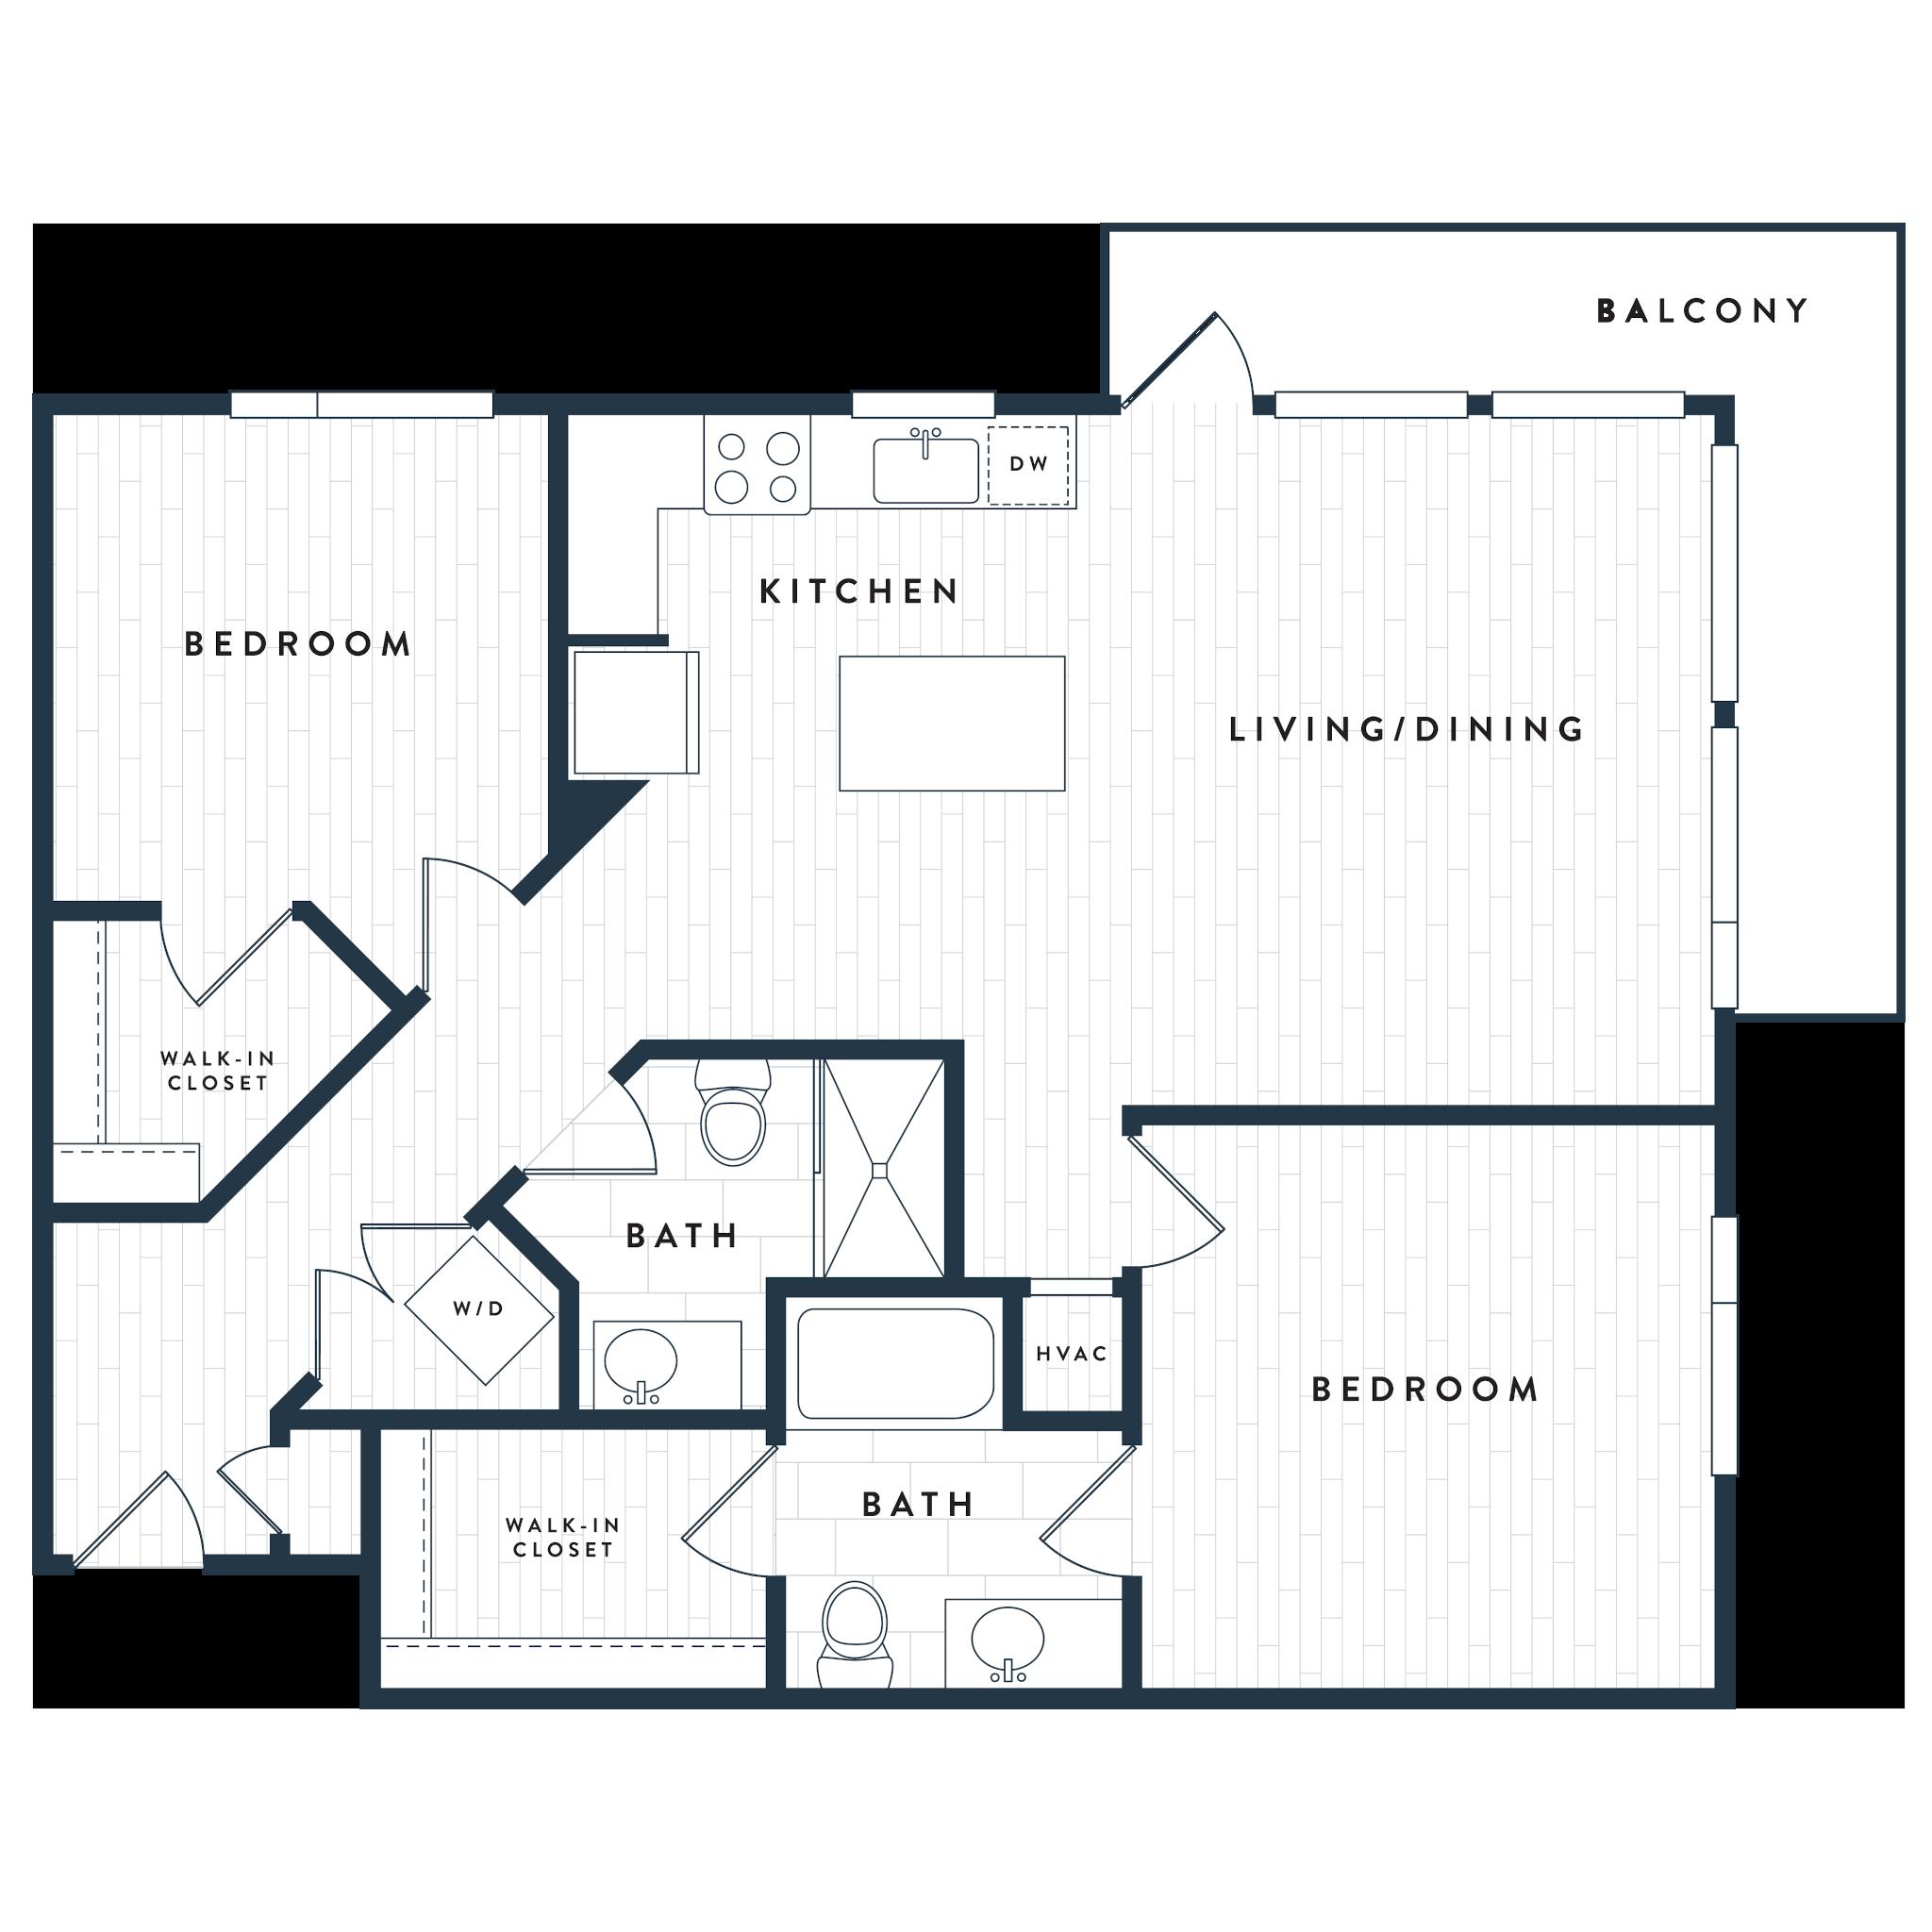 Tangent Apartments Denver Tech Center 2 bedrooms 2 baths Plan 2B